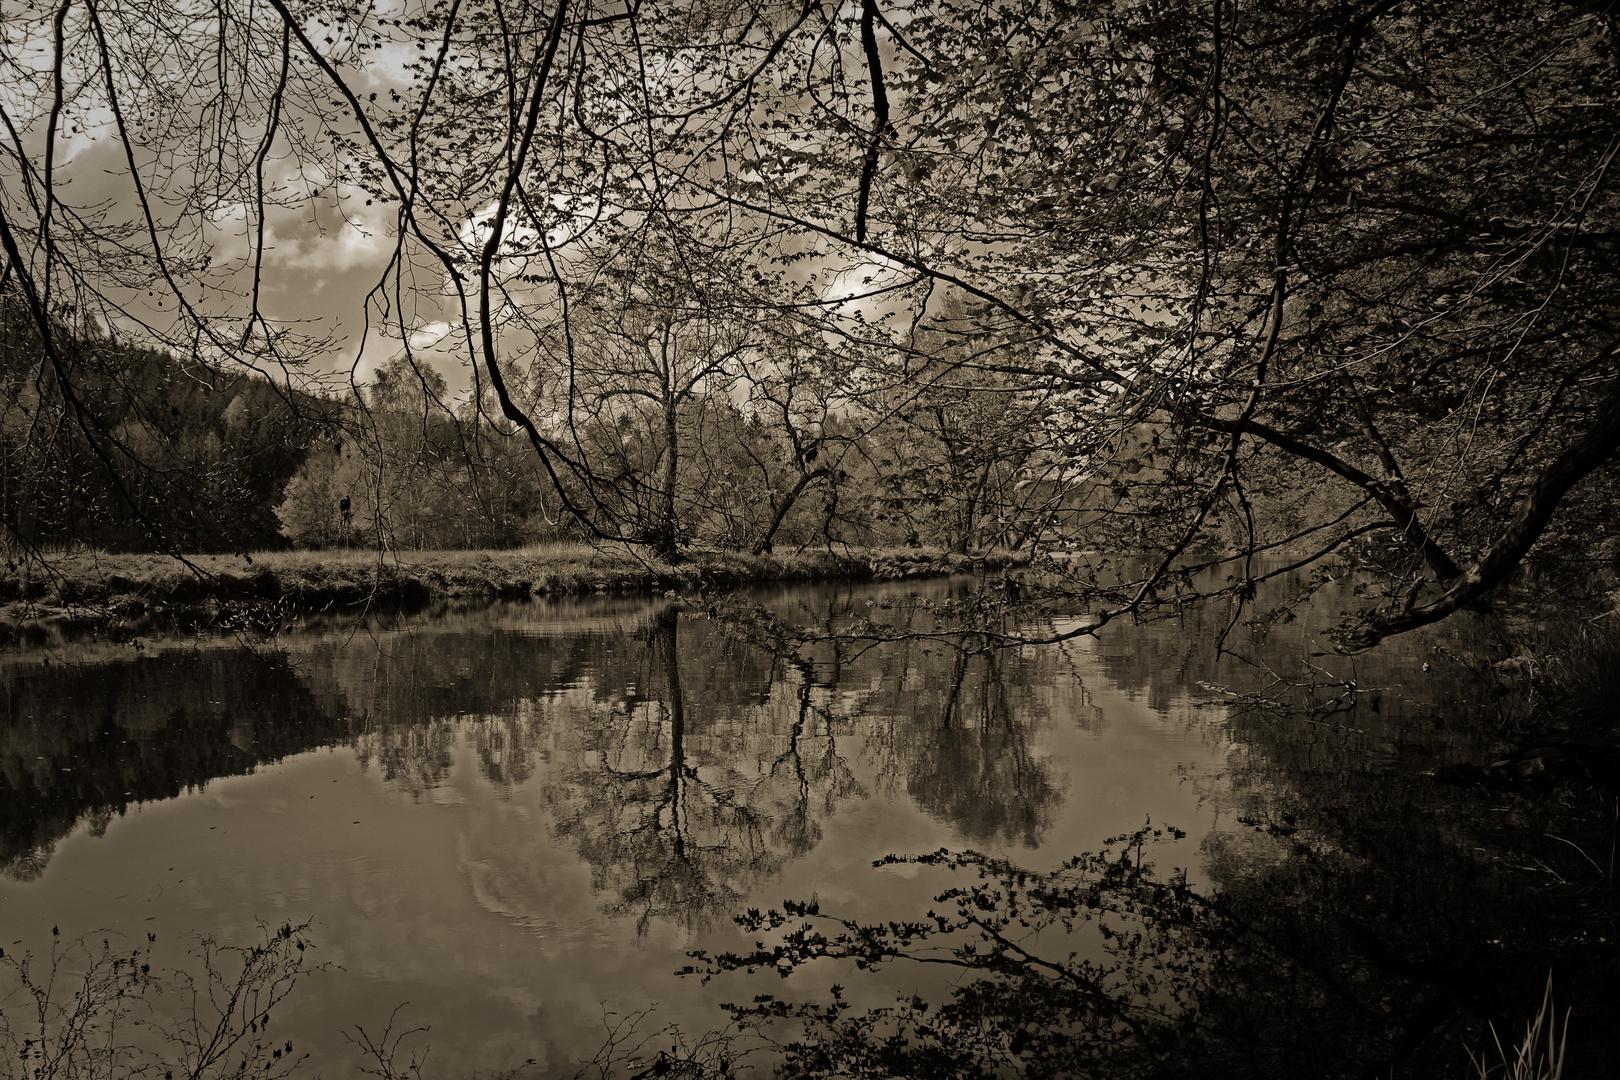 Die Ruhe am Fluß...